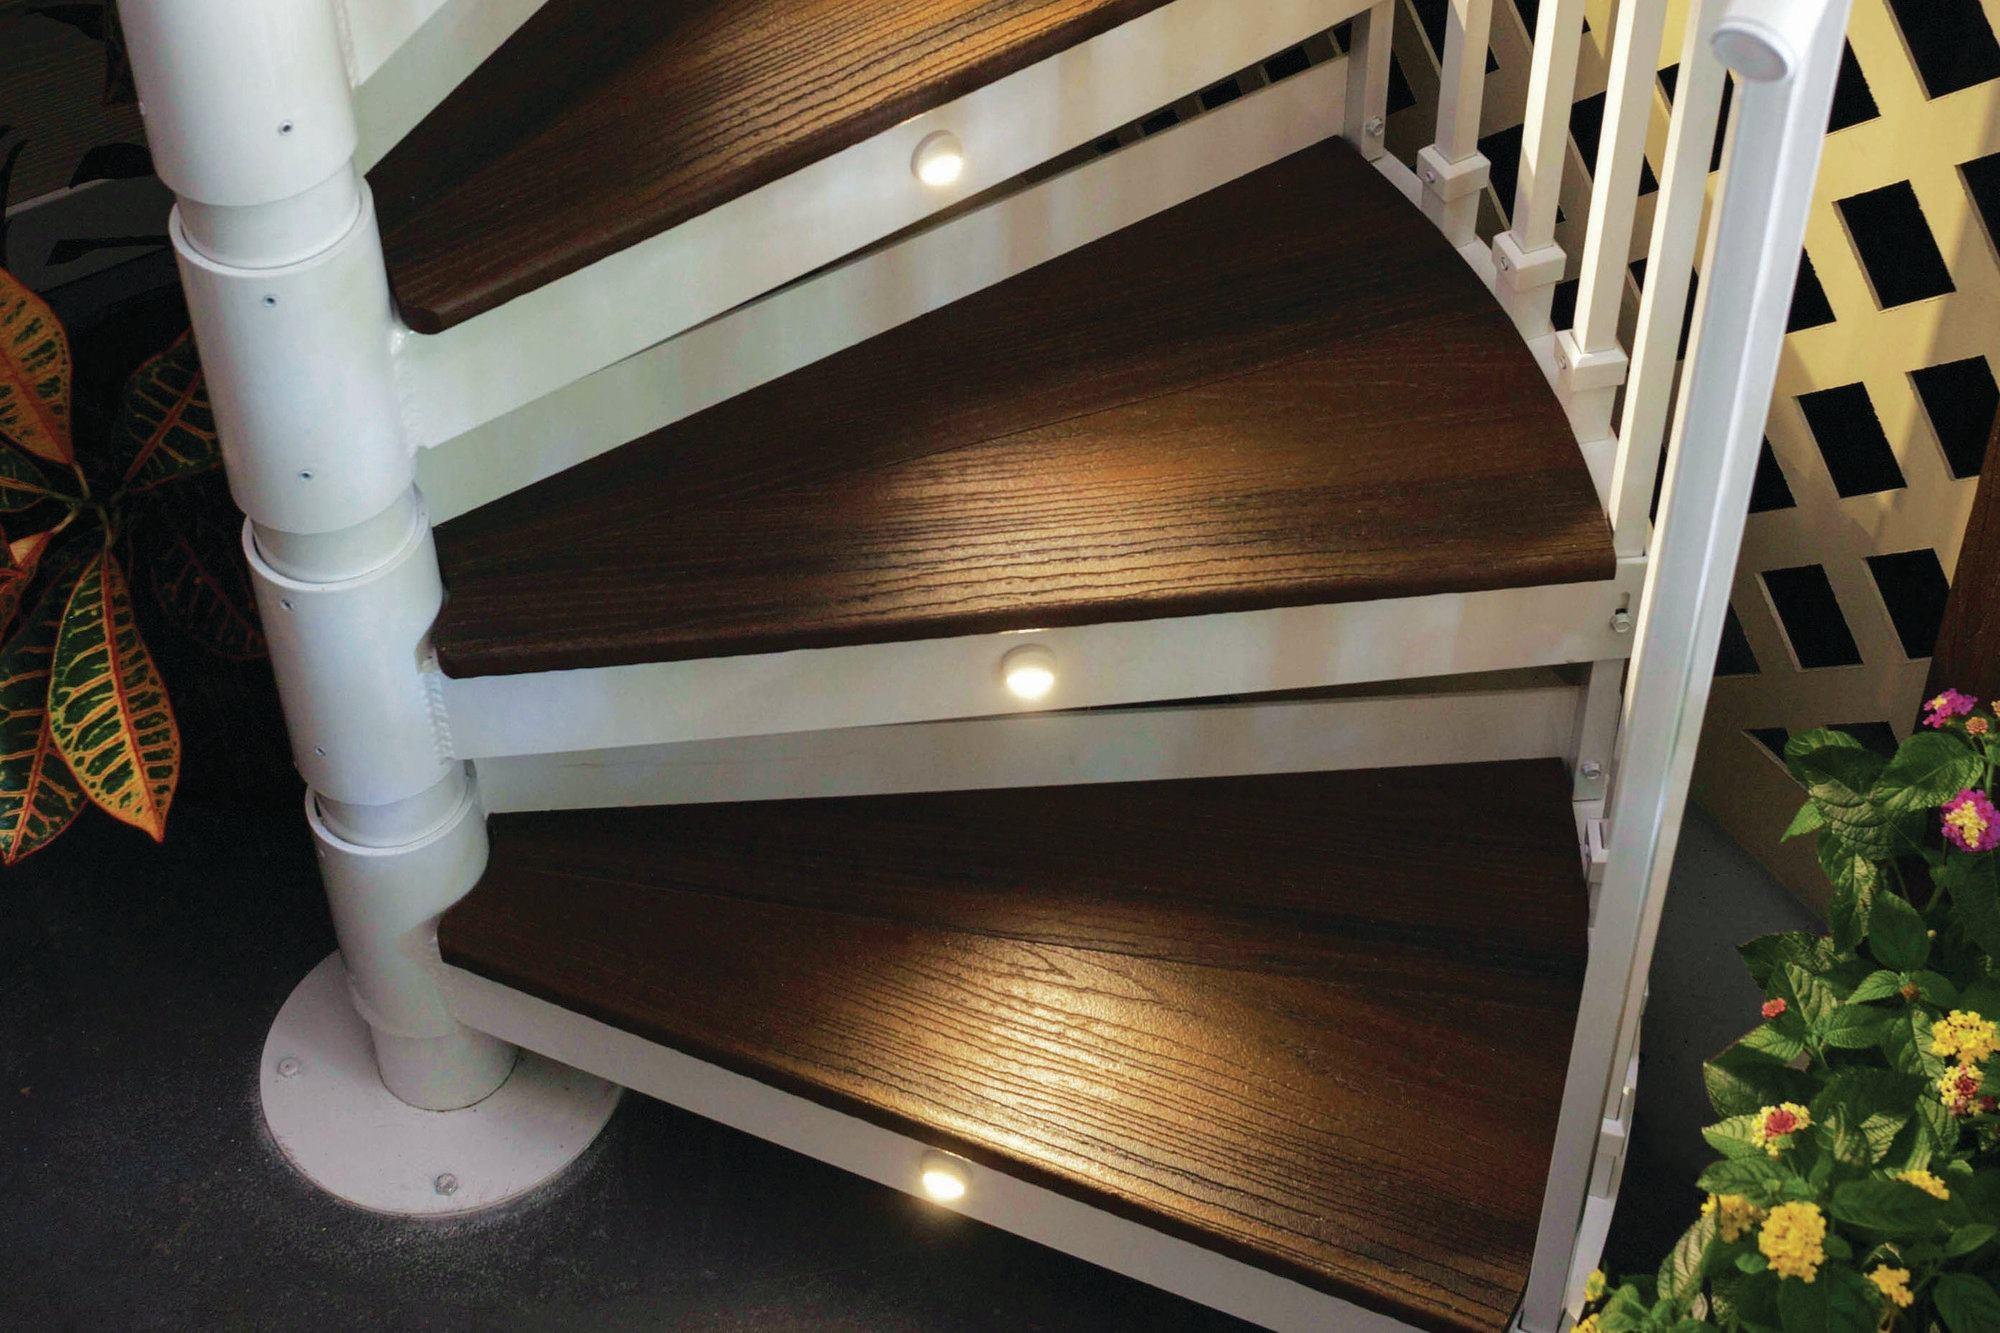 Trex Spiral Stairs Custom Home Magazine | 6 Foot Spiral Staircase | Reroute Galvanized | Stair Case | Mylen Stairs | Wood | Metal